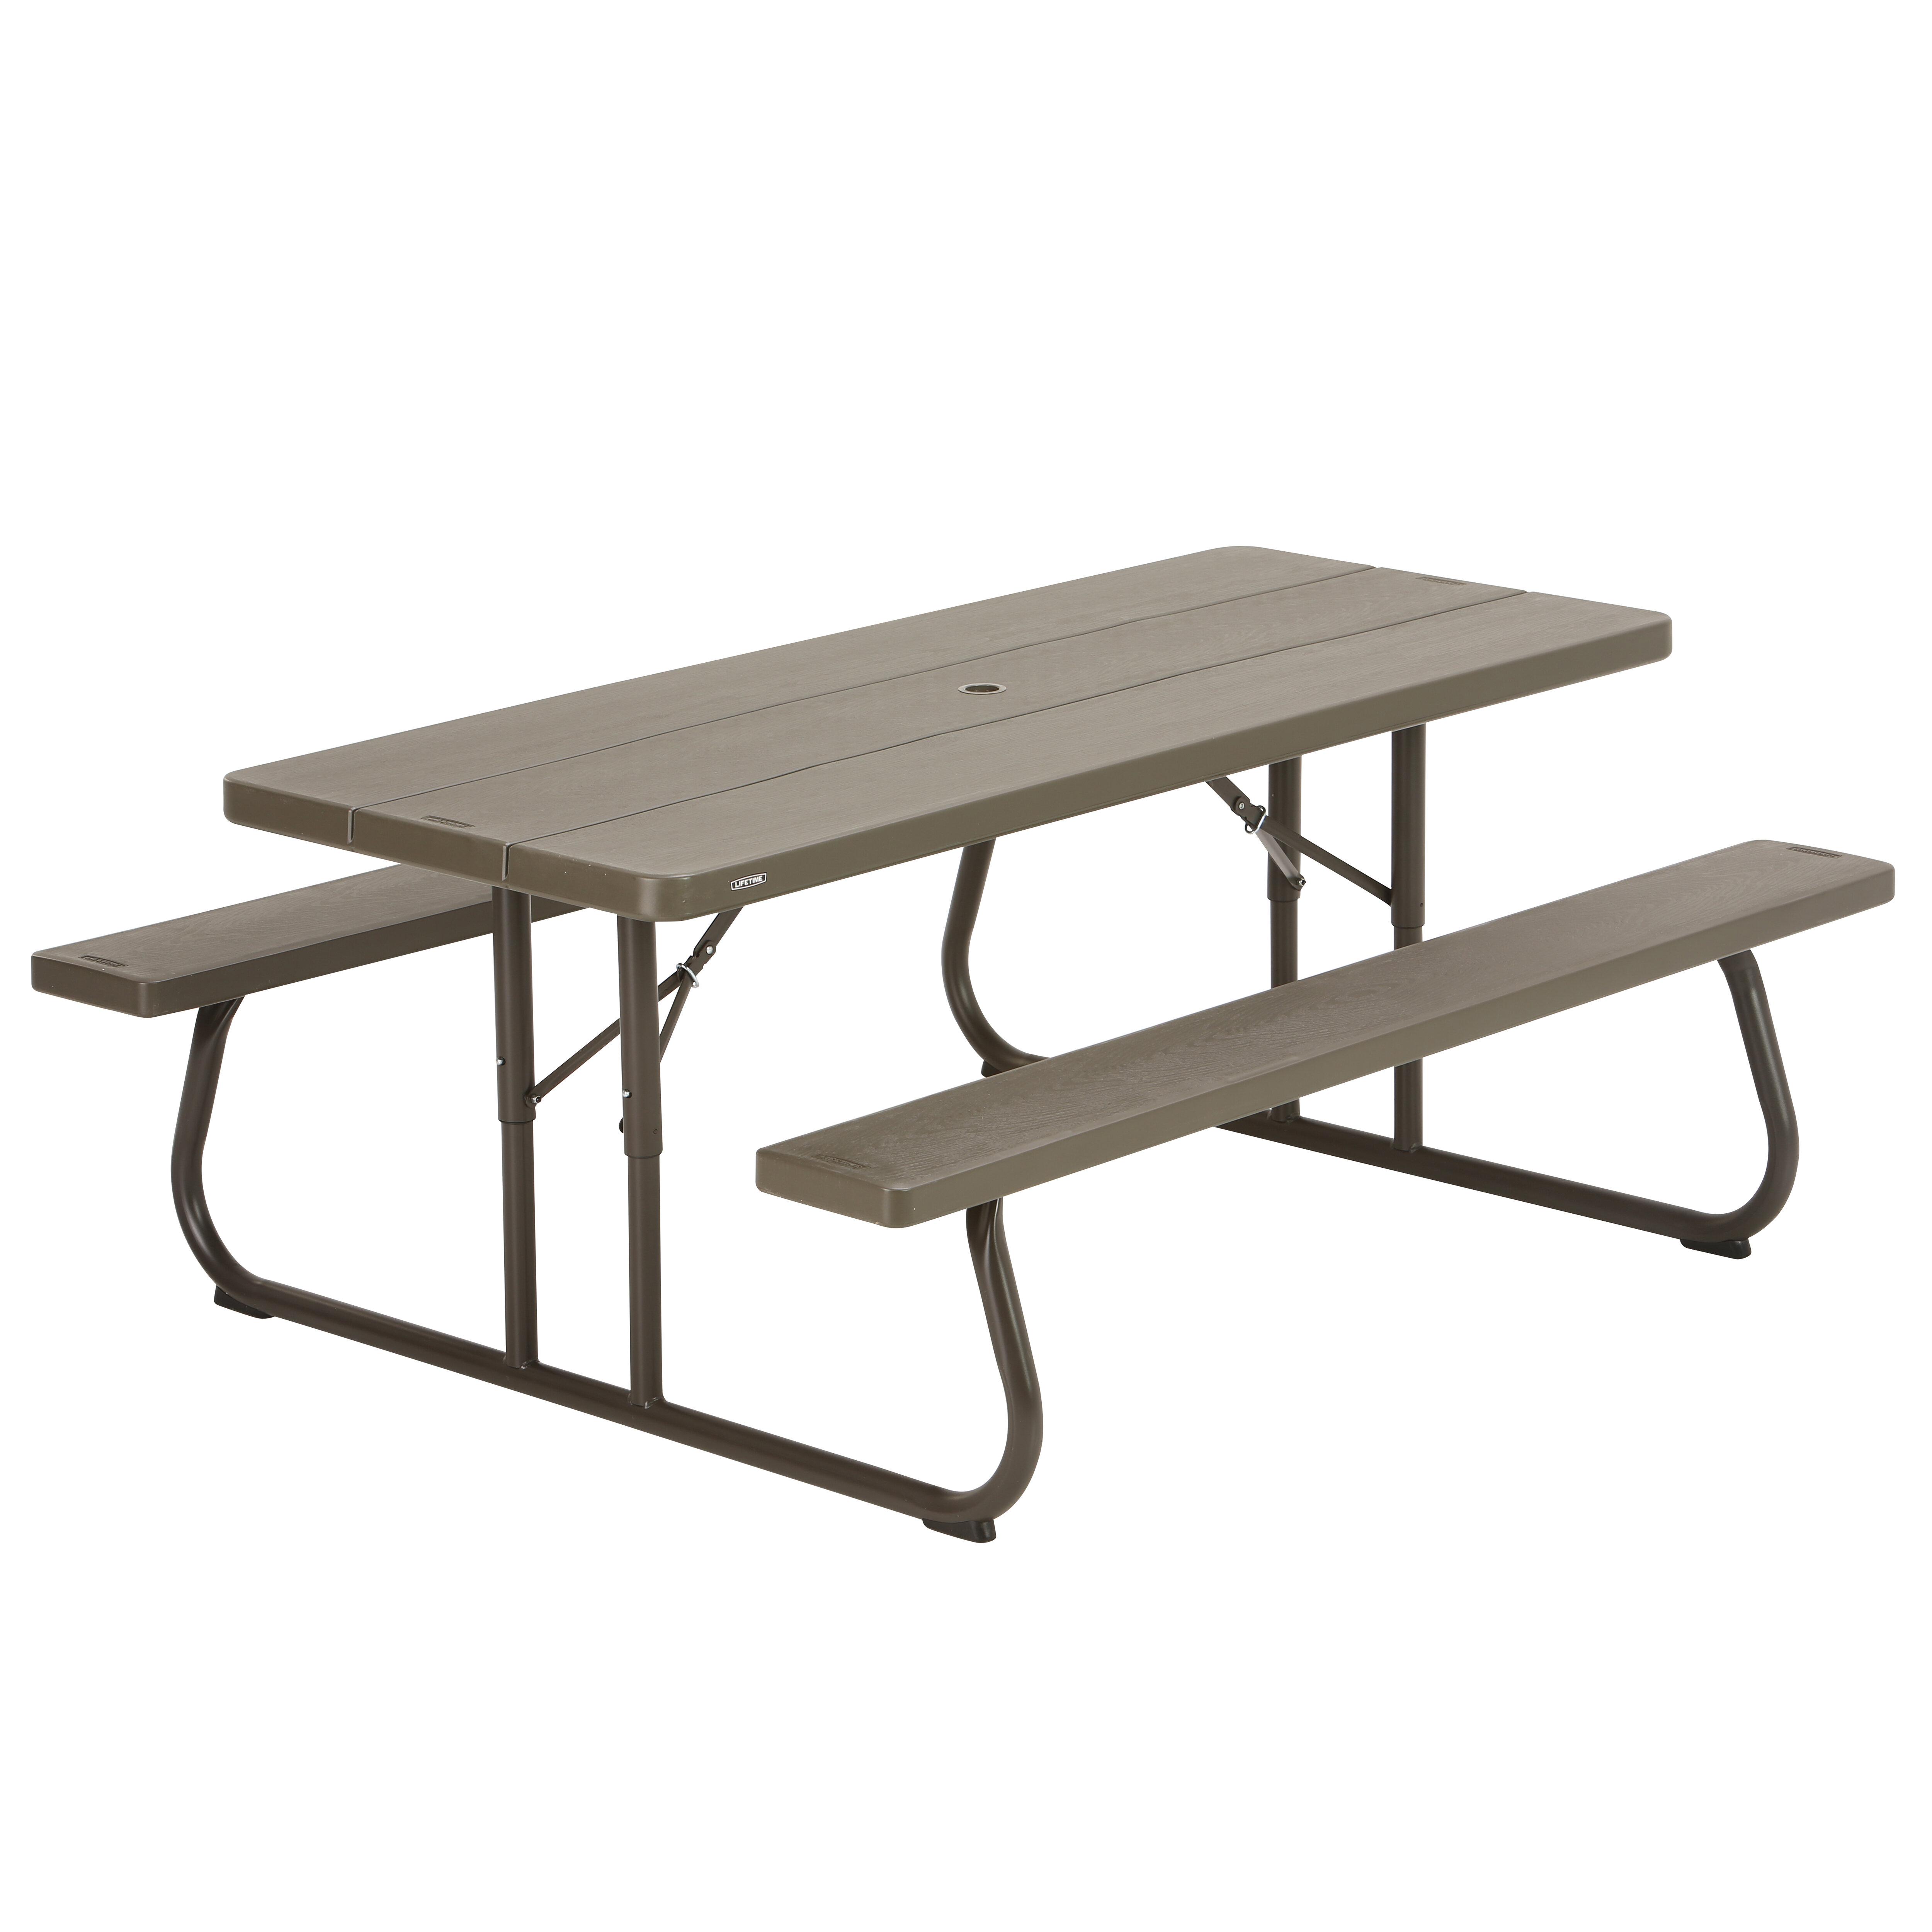 Picnic Table Kit | Wayfair